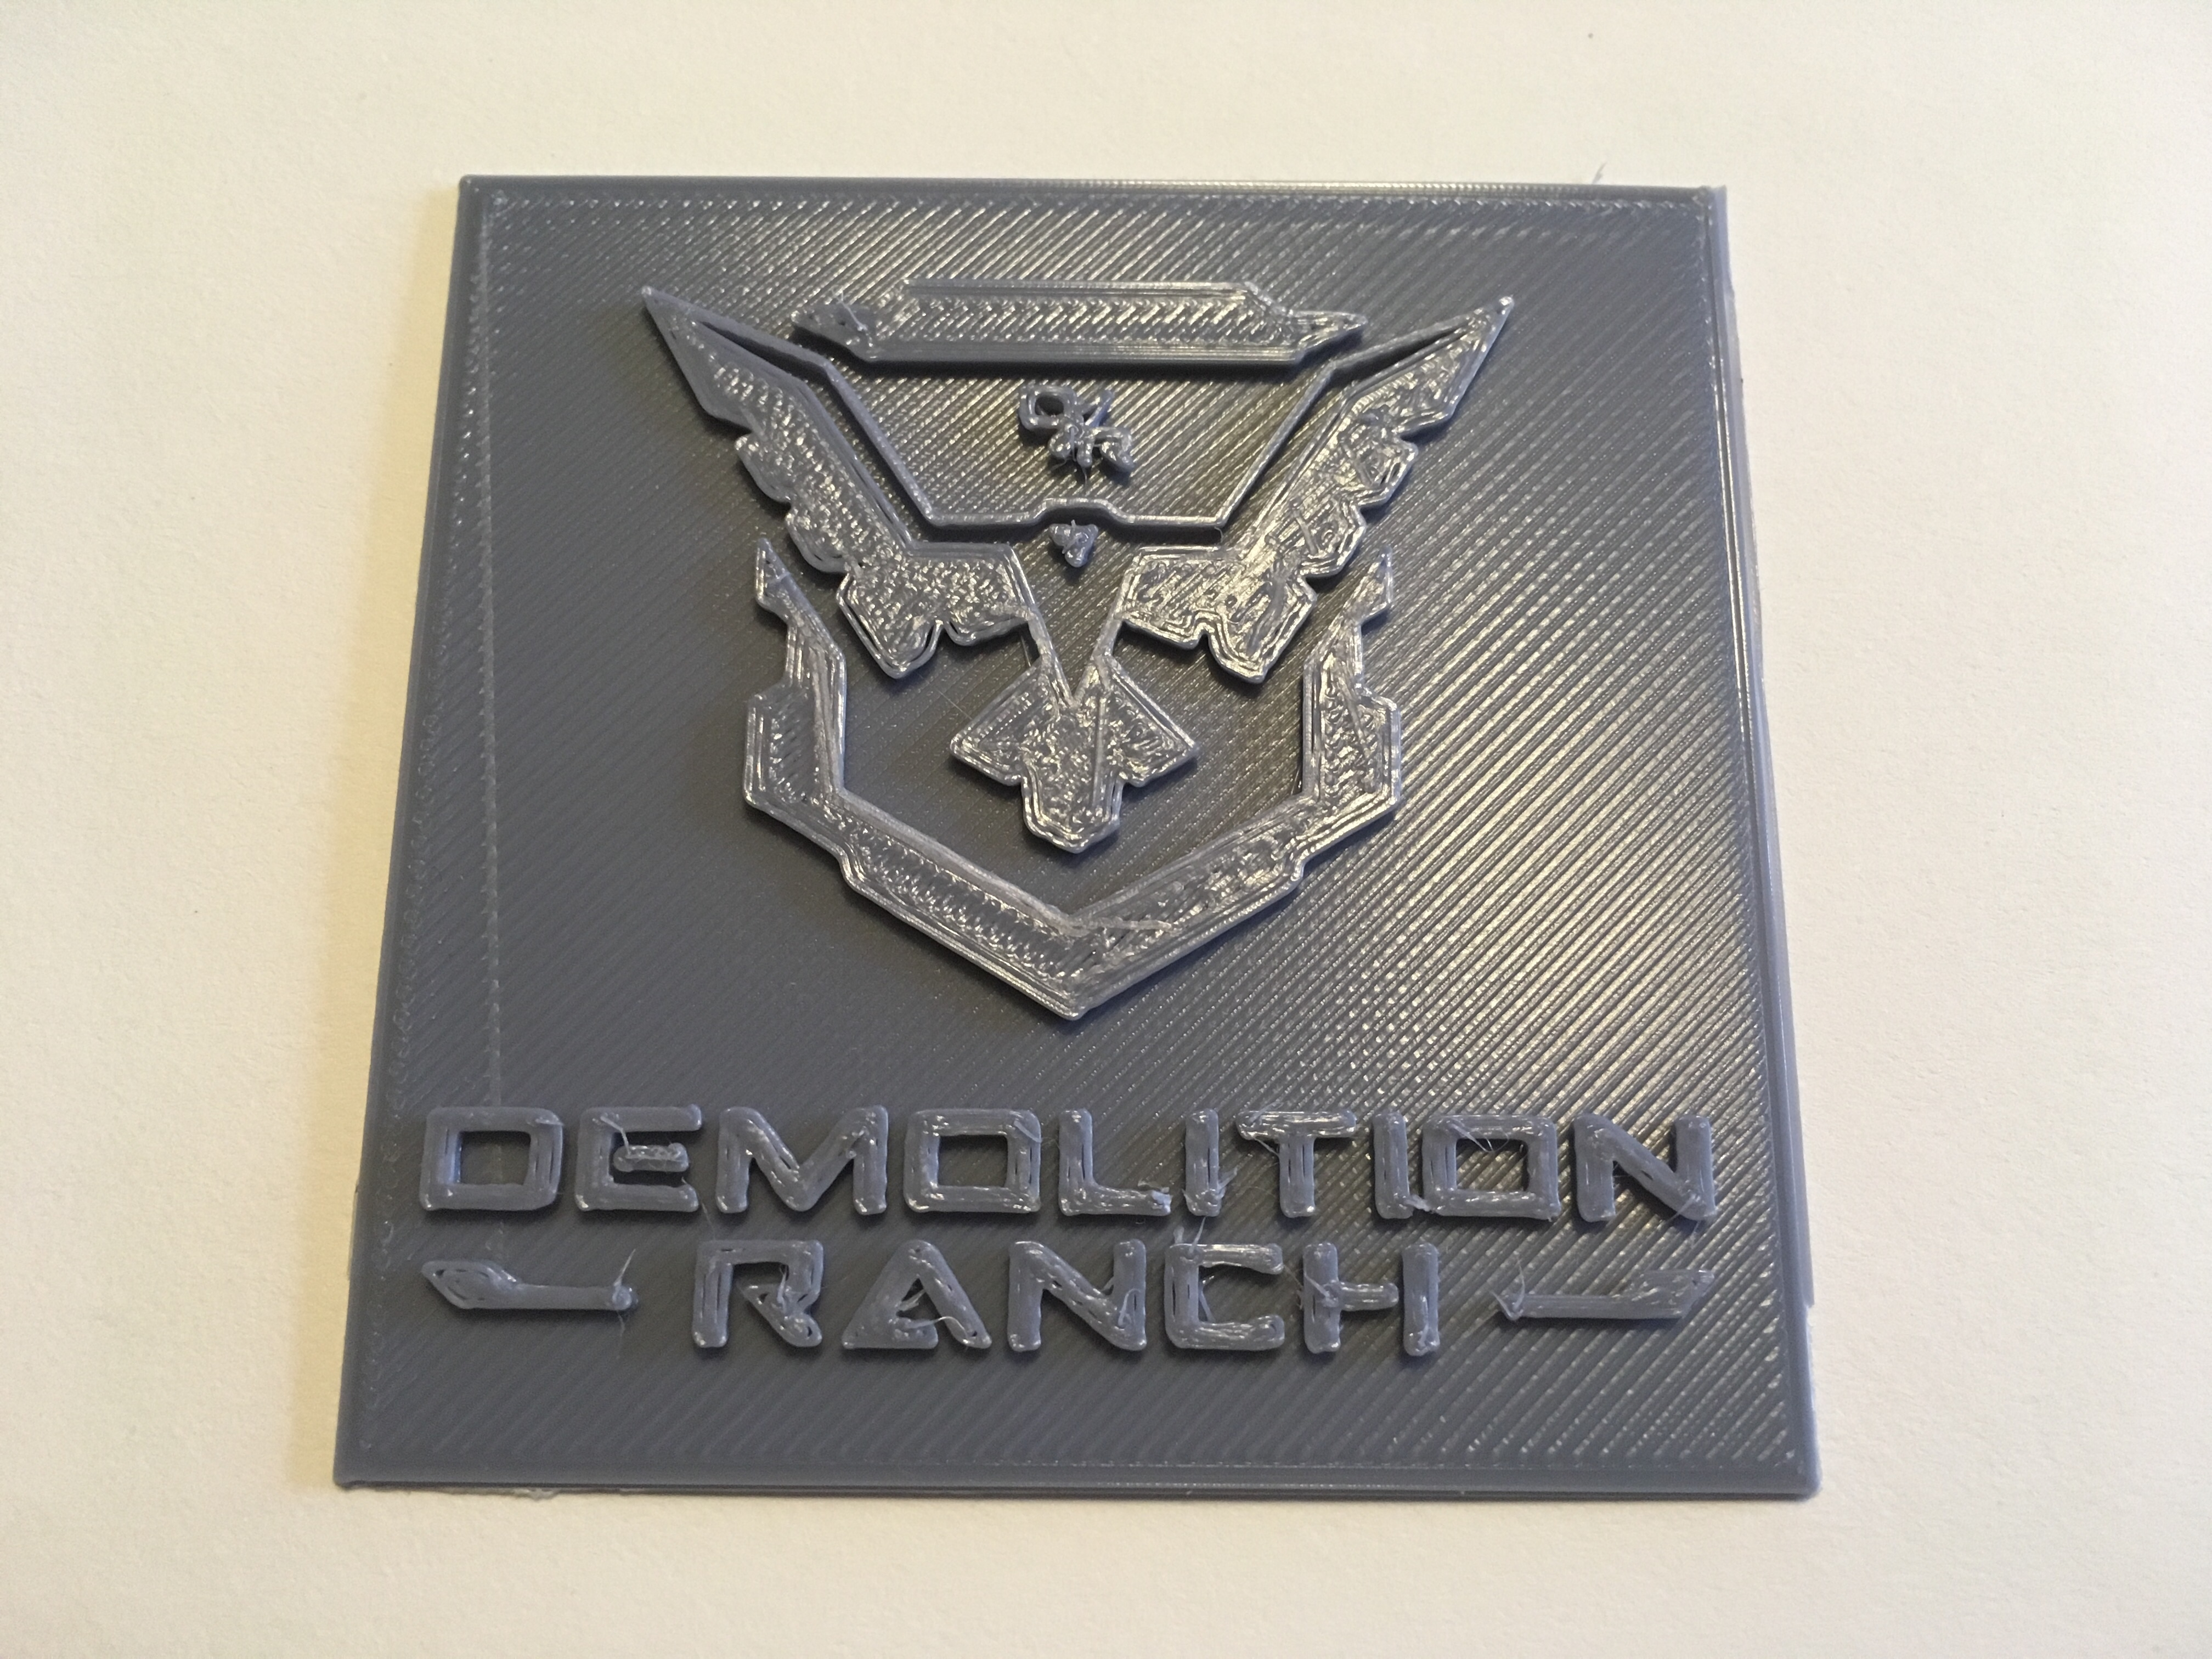 Demolition Ranch Logo by Dramatix084.